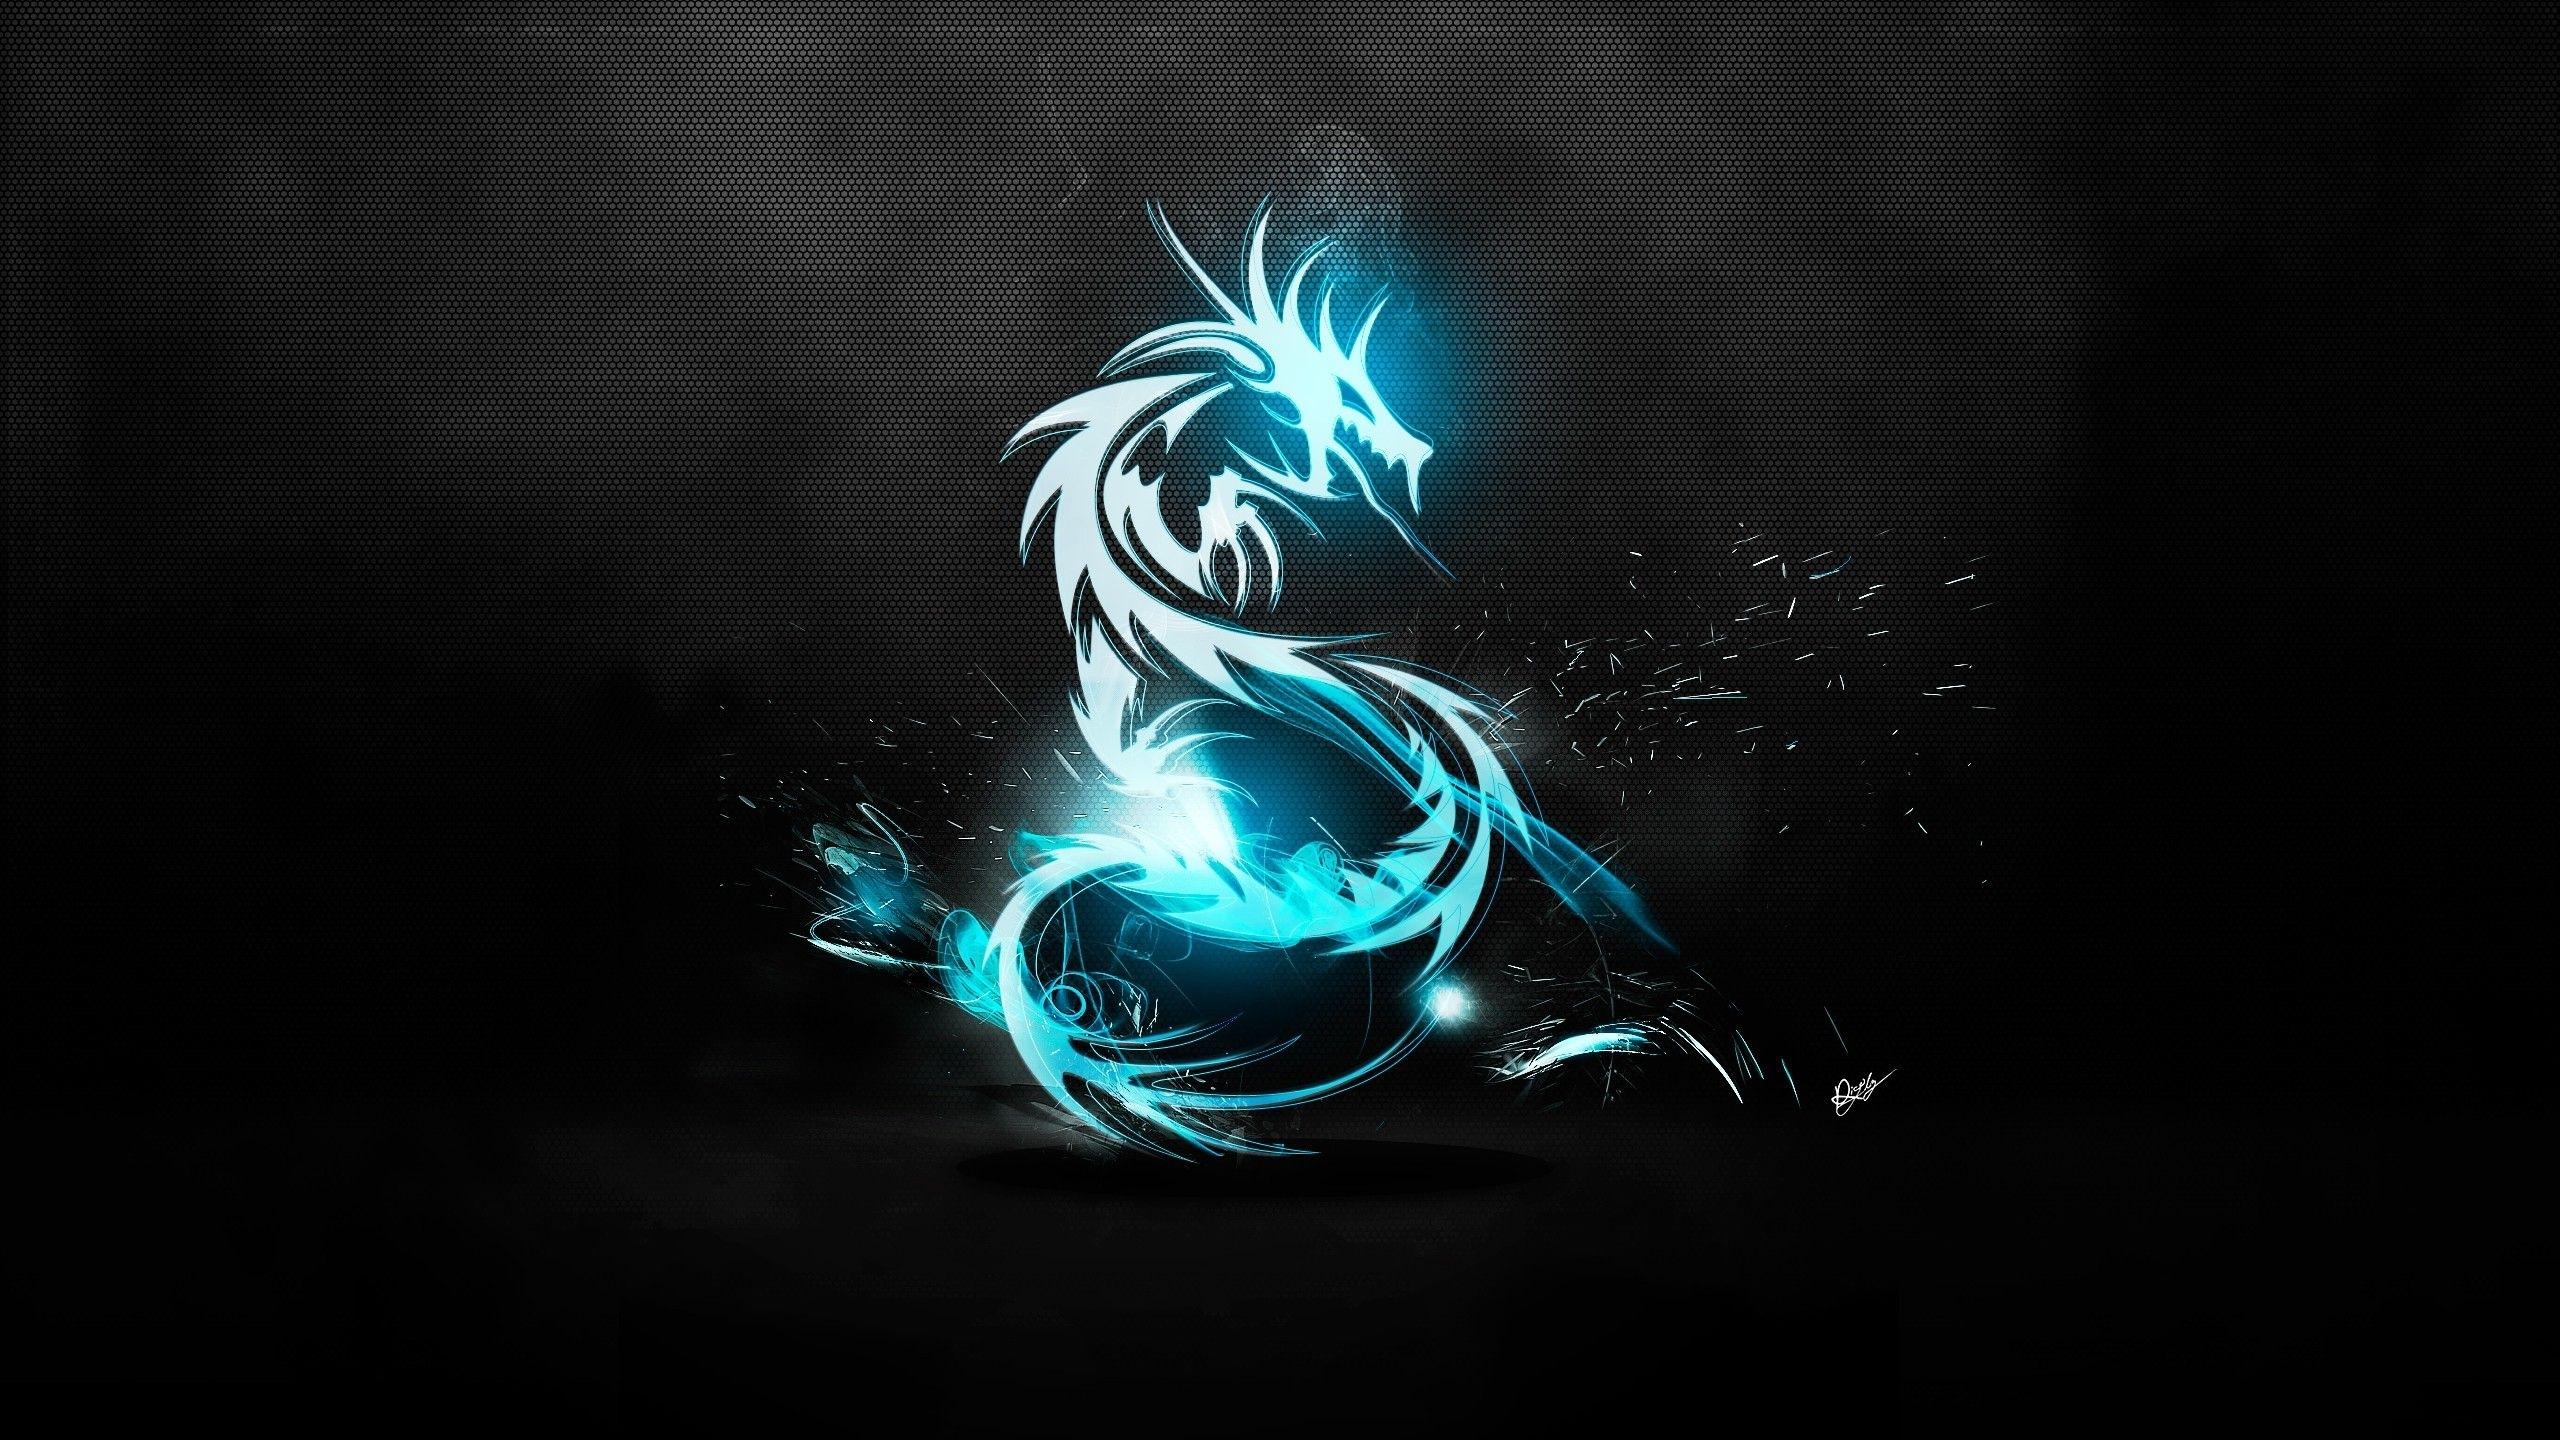 abstract blue blue dragon logos amd black background / 2560x1440